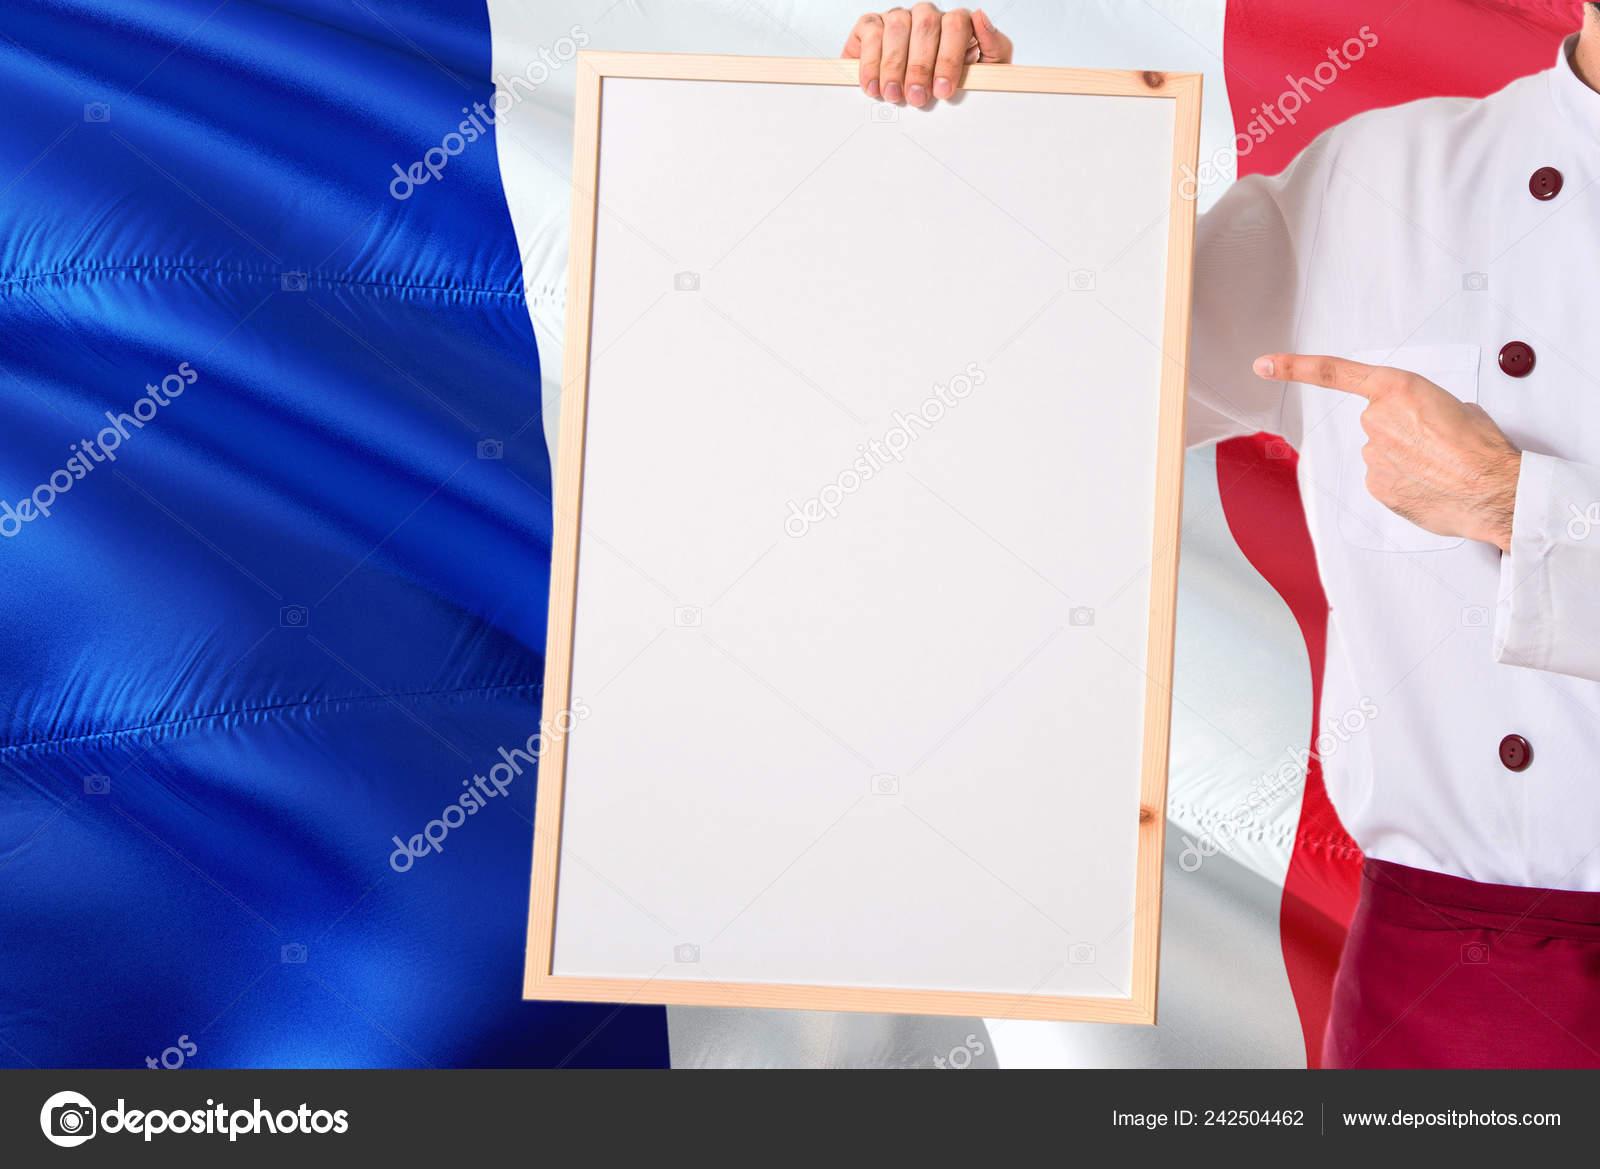 FRENCH EAZEL TÉLÉCHARGER